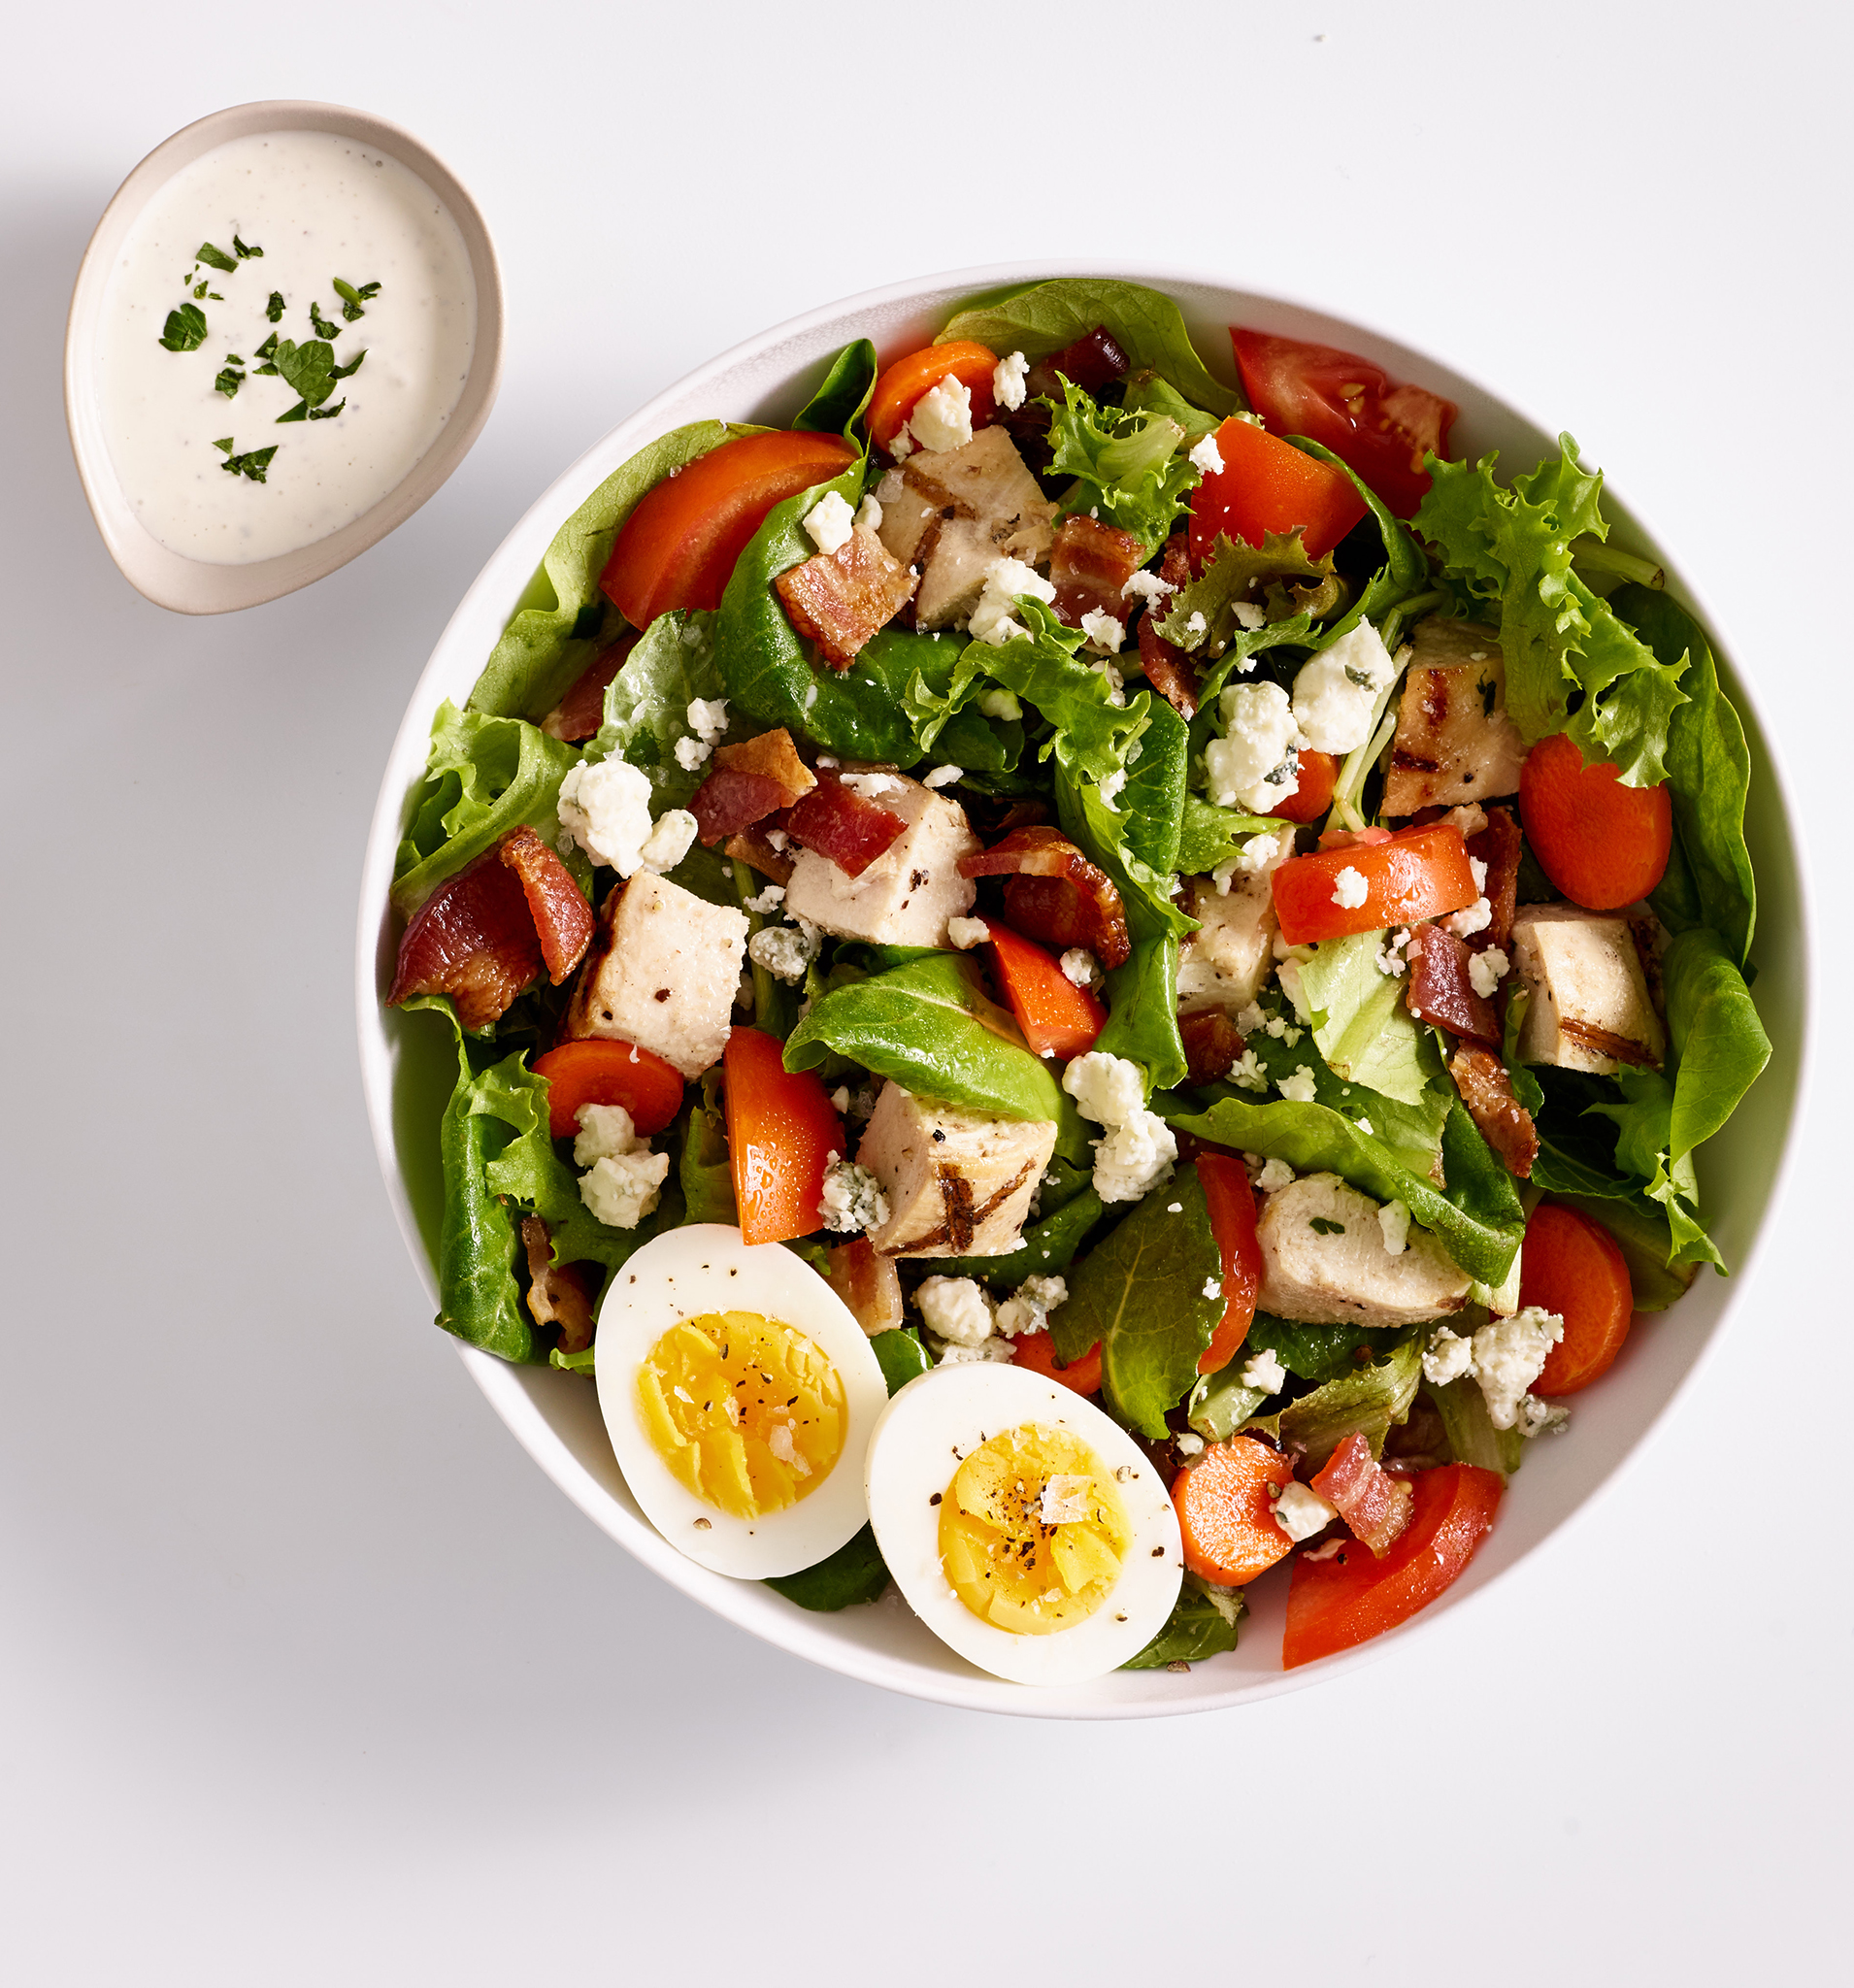 16-Salad-Bowls-15-NR-mr.jpg